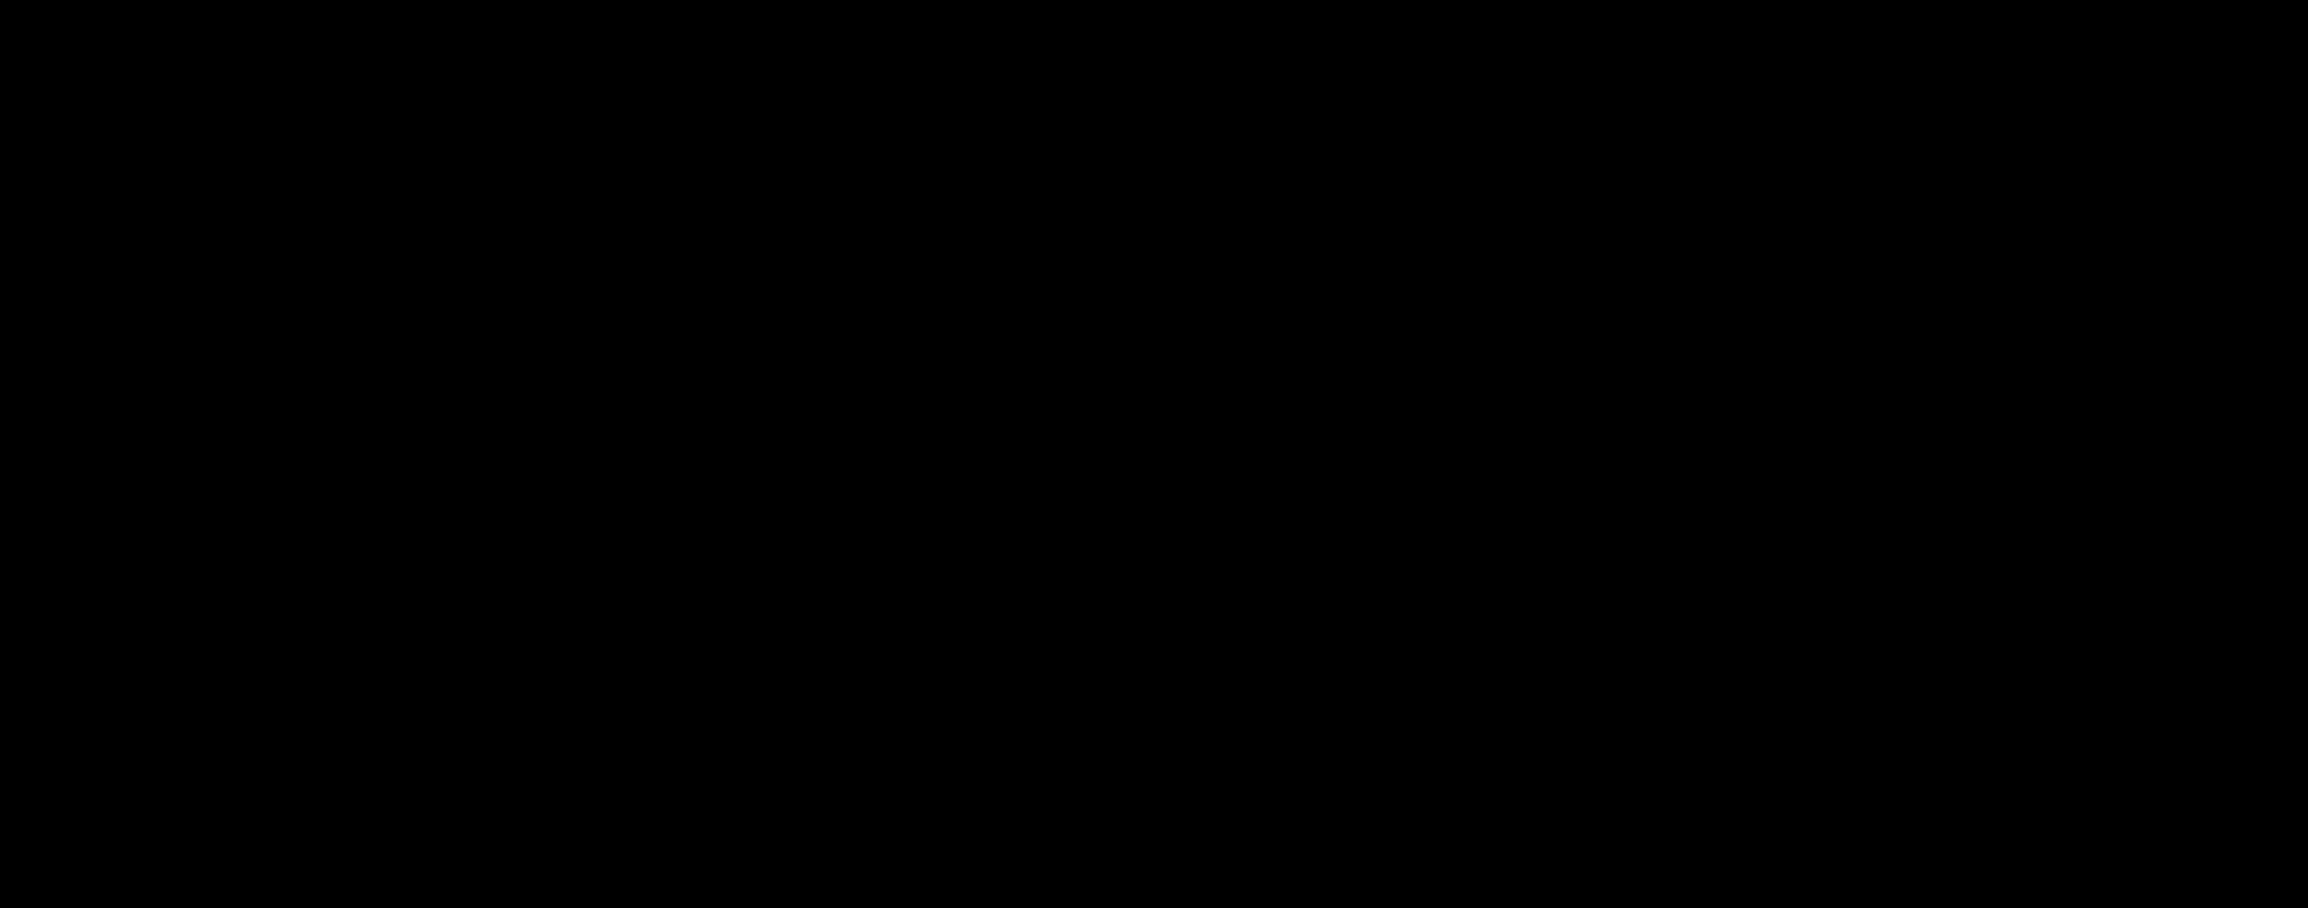 Silhouette Guitar Clipart.